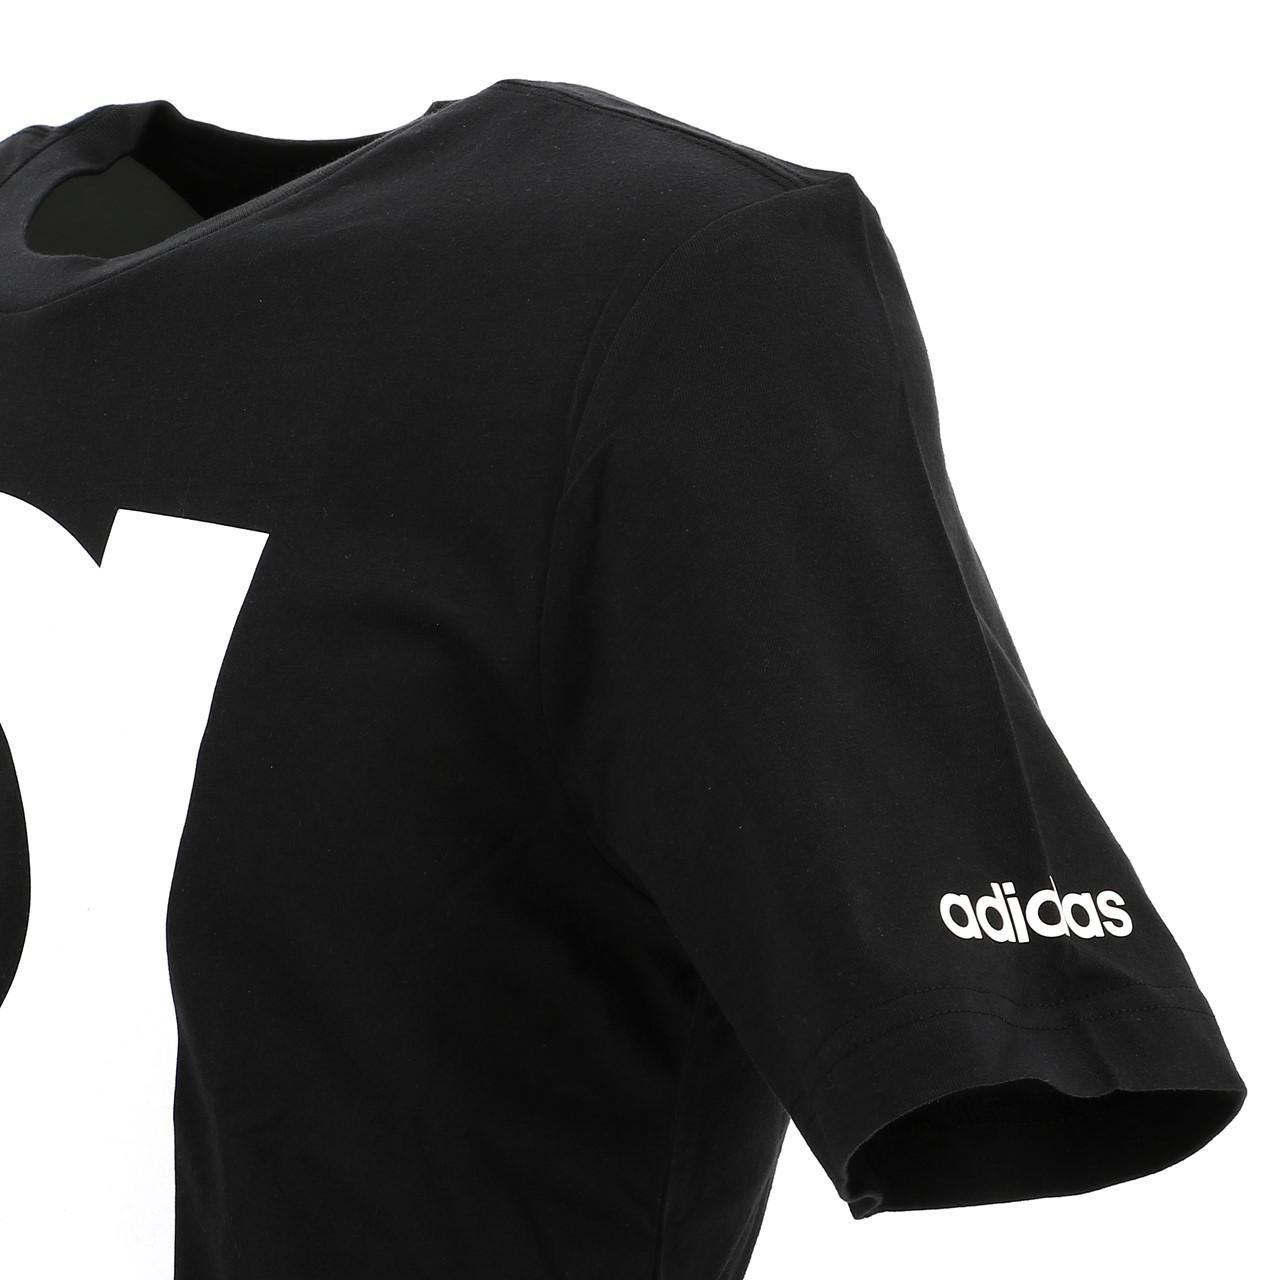 Short-Adidas-Brand-Black-Mc-Tee-Black-18283-New thumbnail 3